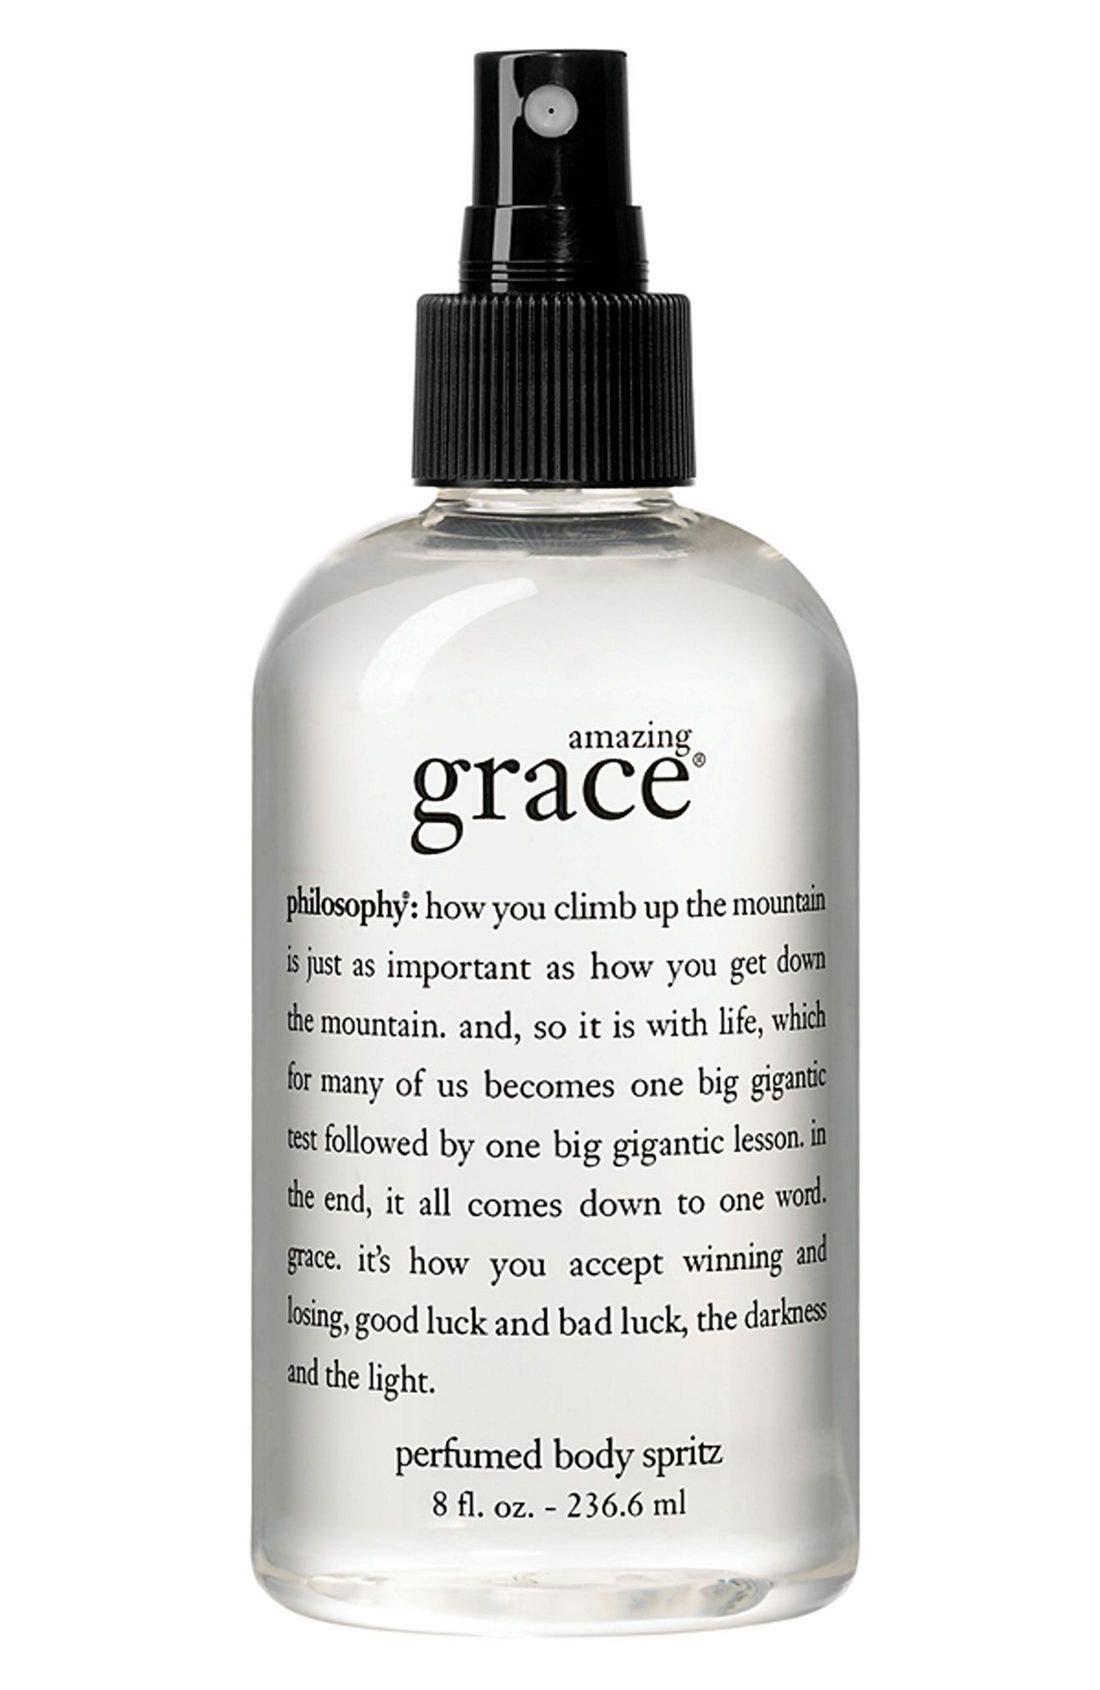 philosophy 'amazing grace' perfumed body spritz